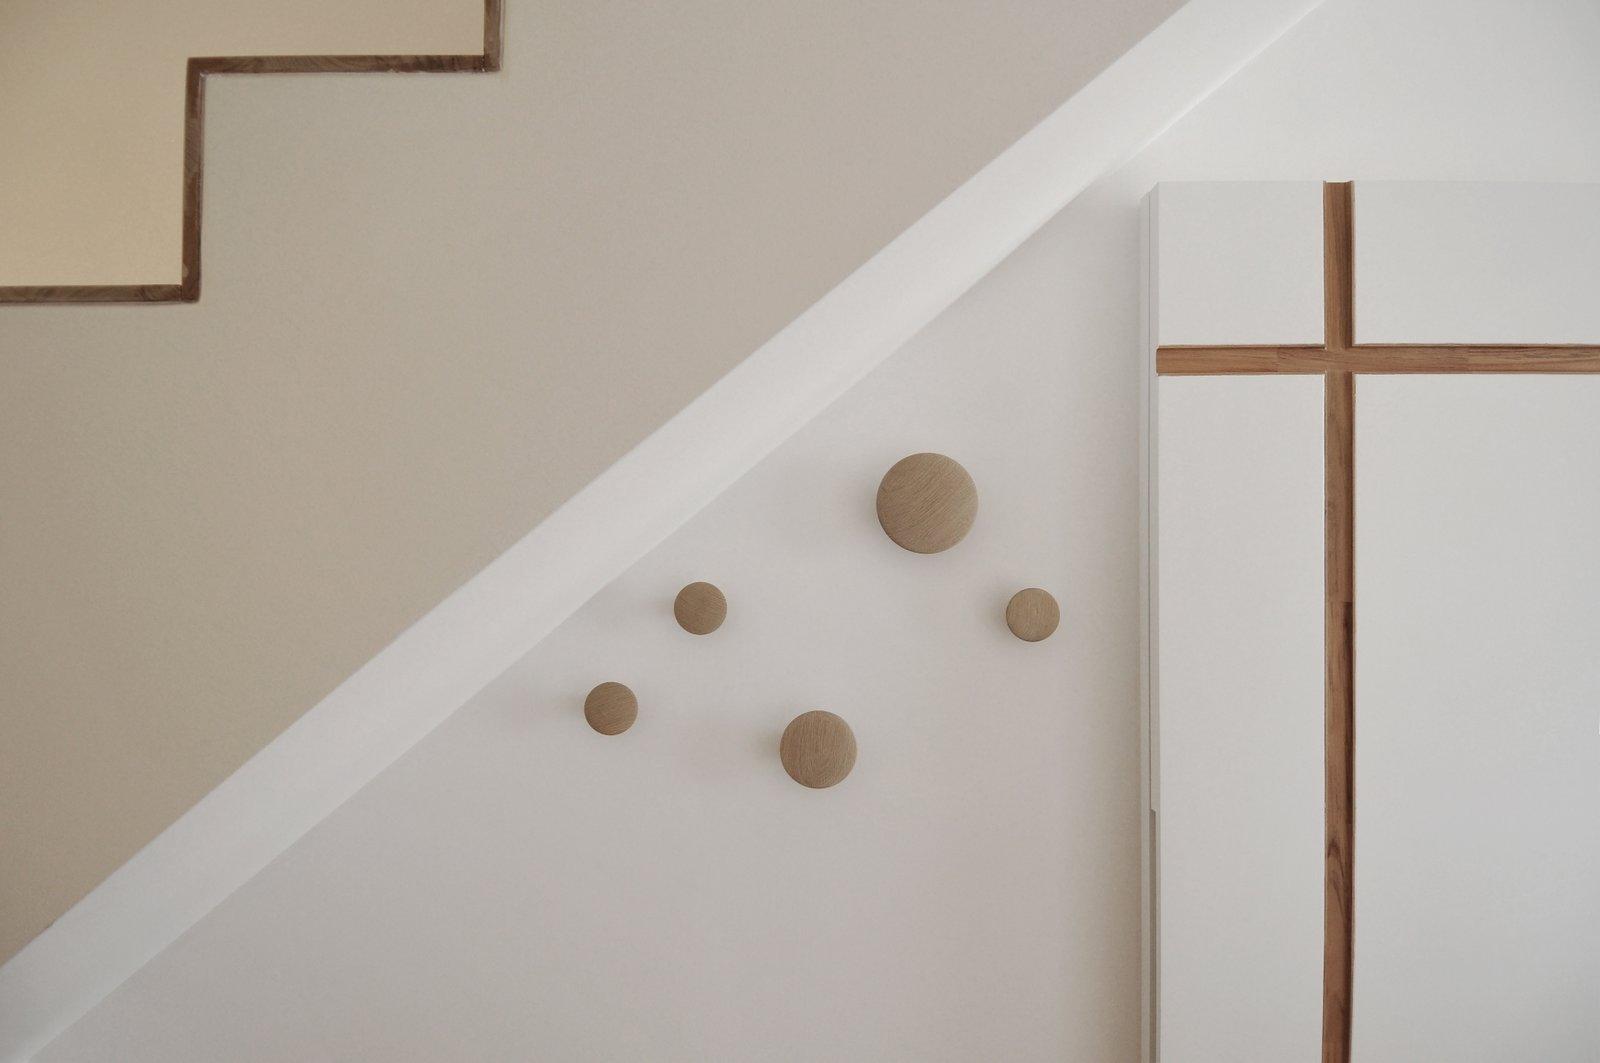 Tagged: Light Hardwood Floor, Staircase, Metal Railing, and Wood Tread.  cdr by tissellistudioarchitetti